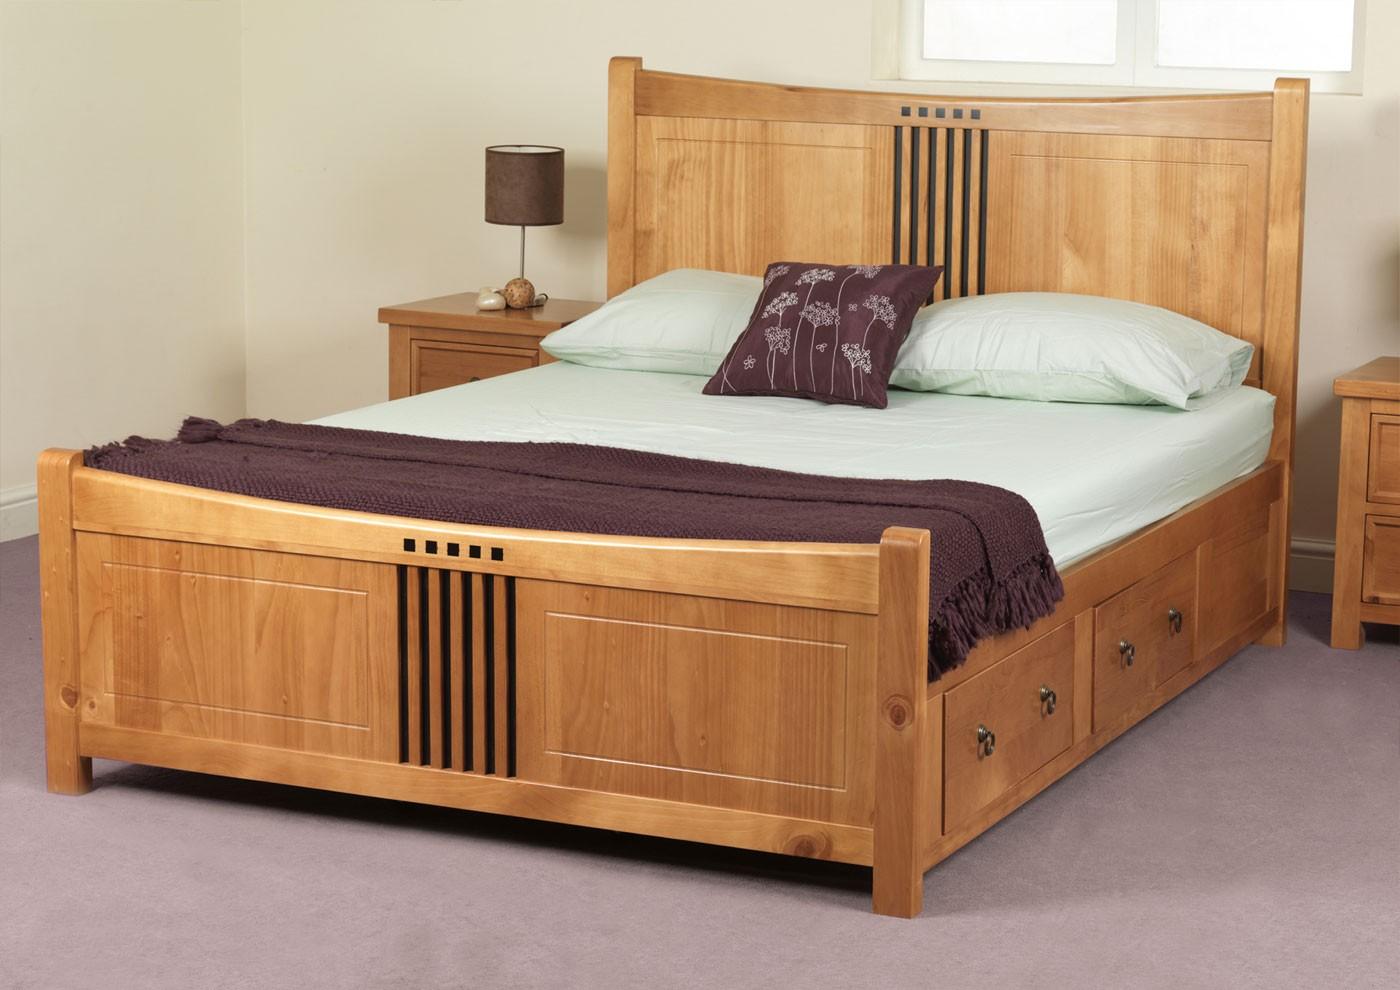 wooden beds bespoke oak bed AWONXHA